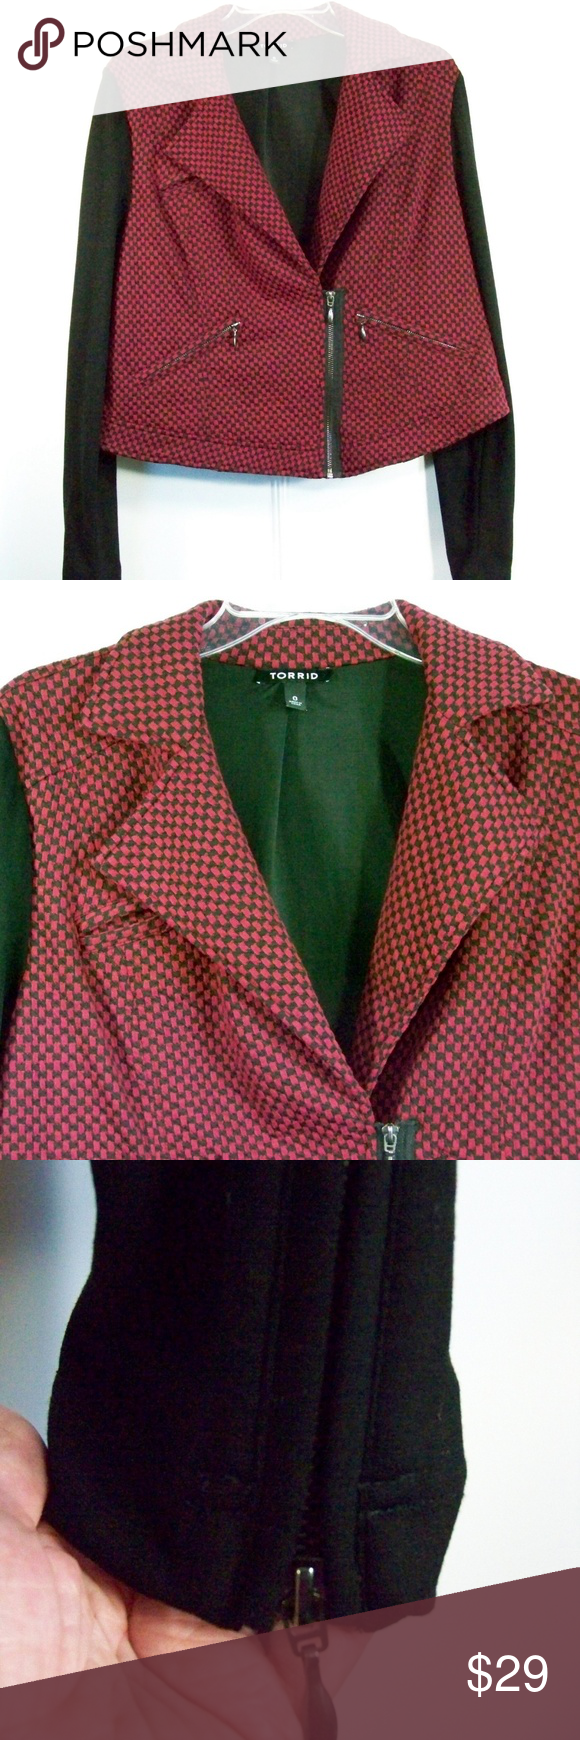 d62a2dcc594ad TORRID Sz 0 Sz L Burgundy Black Knit Moto Jacket TORRID Sz 0 Sz L Burgundy